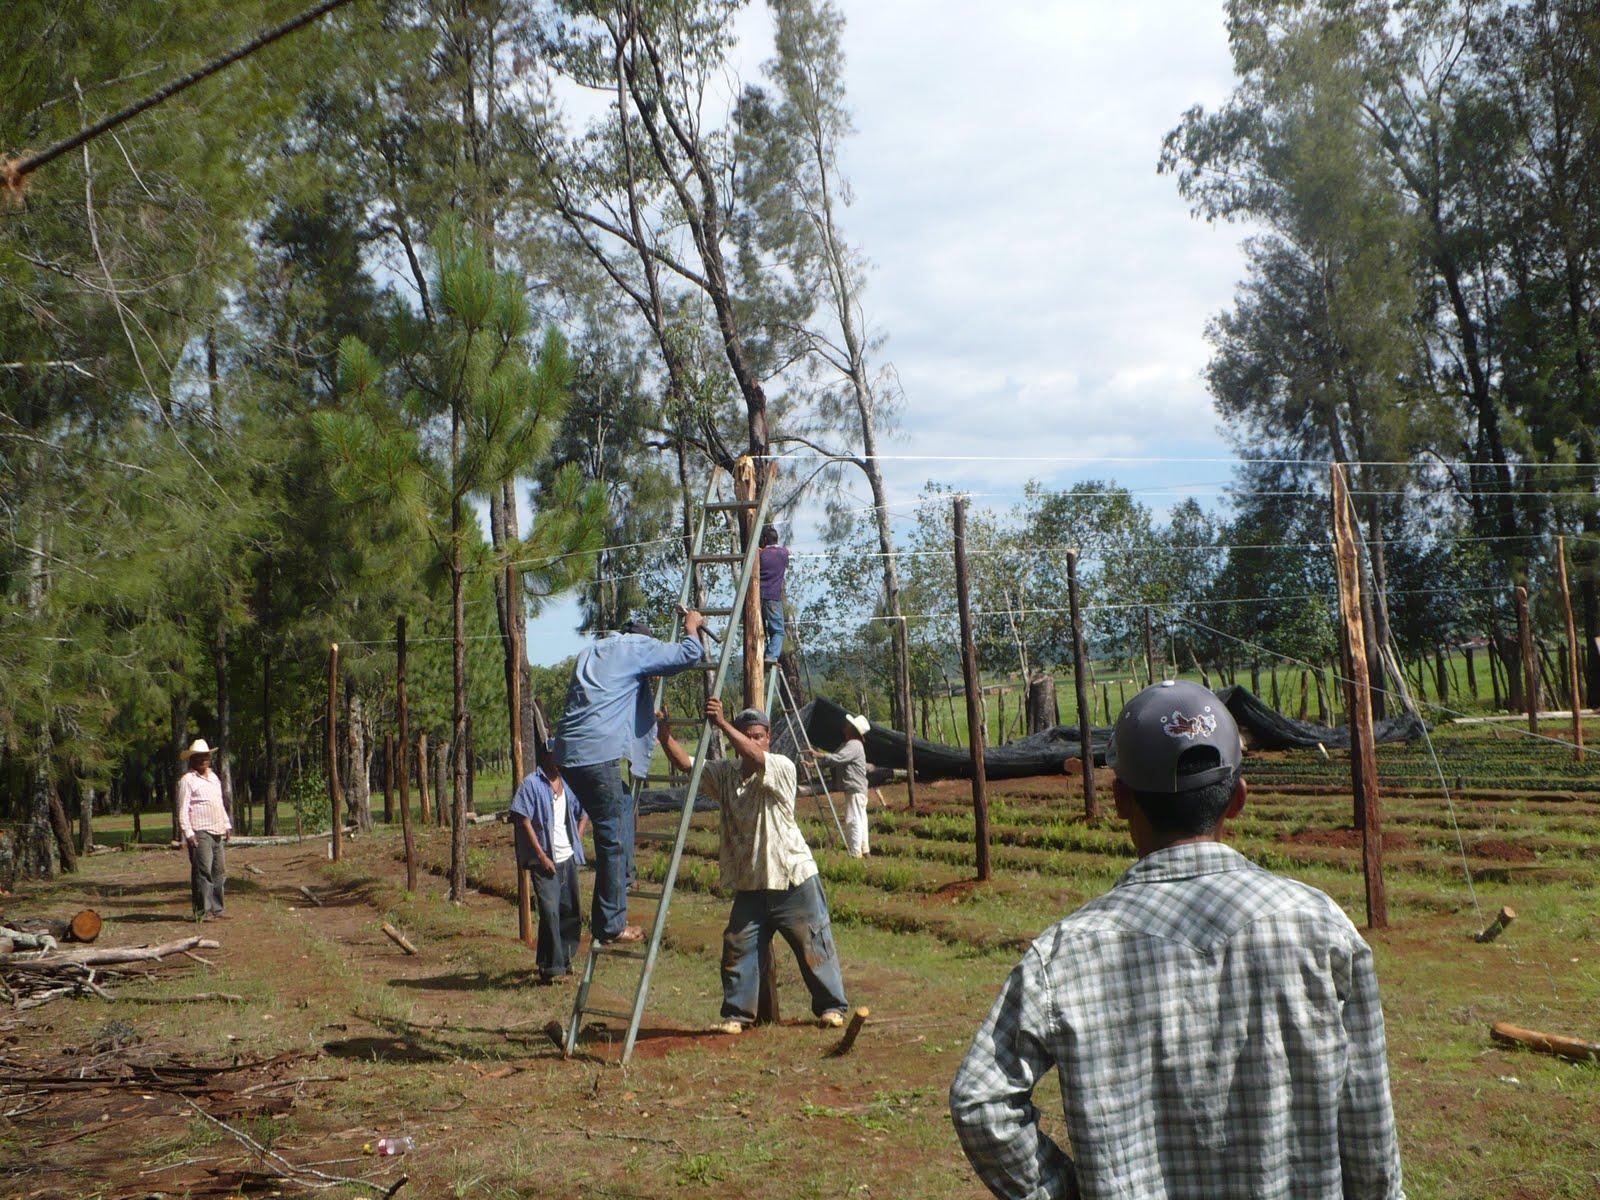 Tecno asesores estructura del vivero forestal for Vivero estructura